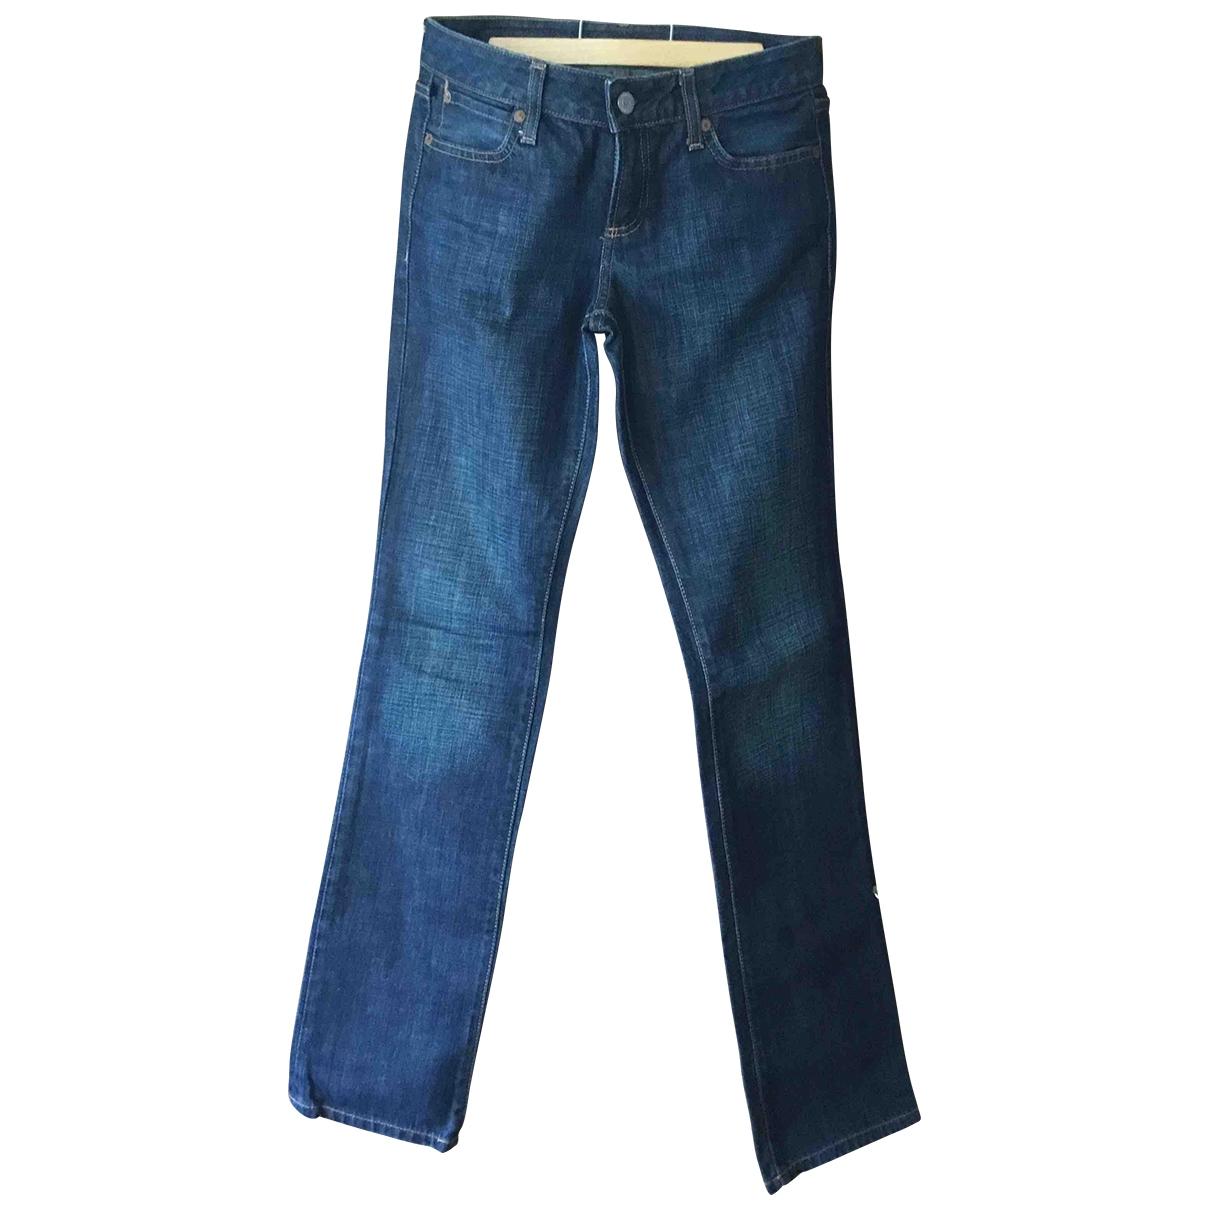 Polo Ralph Lauren \N Blue Cotton Jeans for Women 36 FR